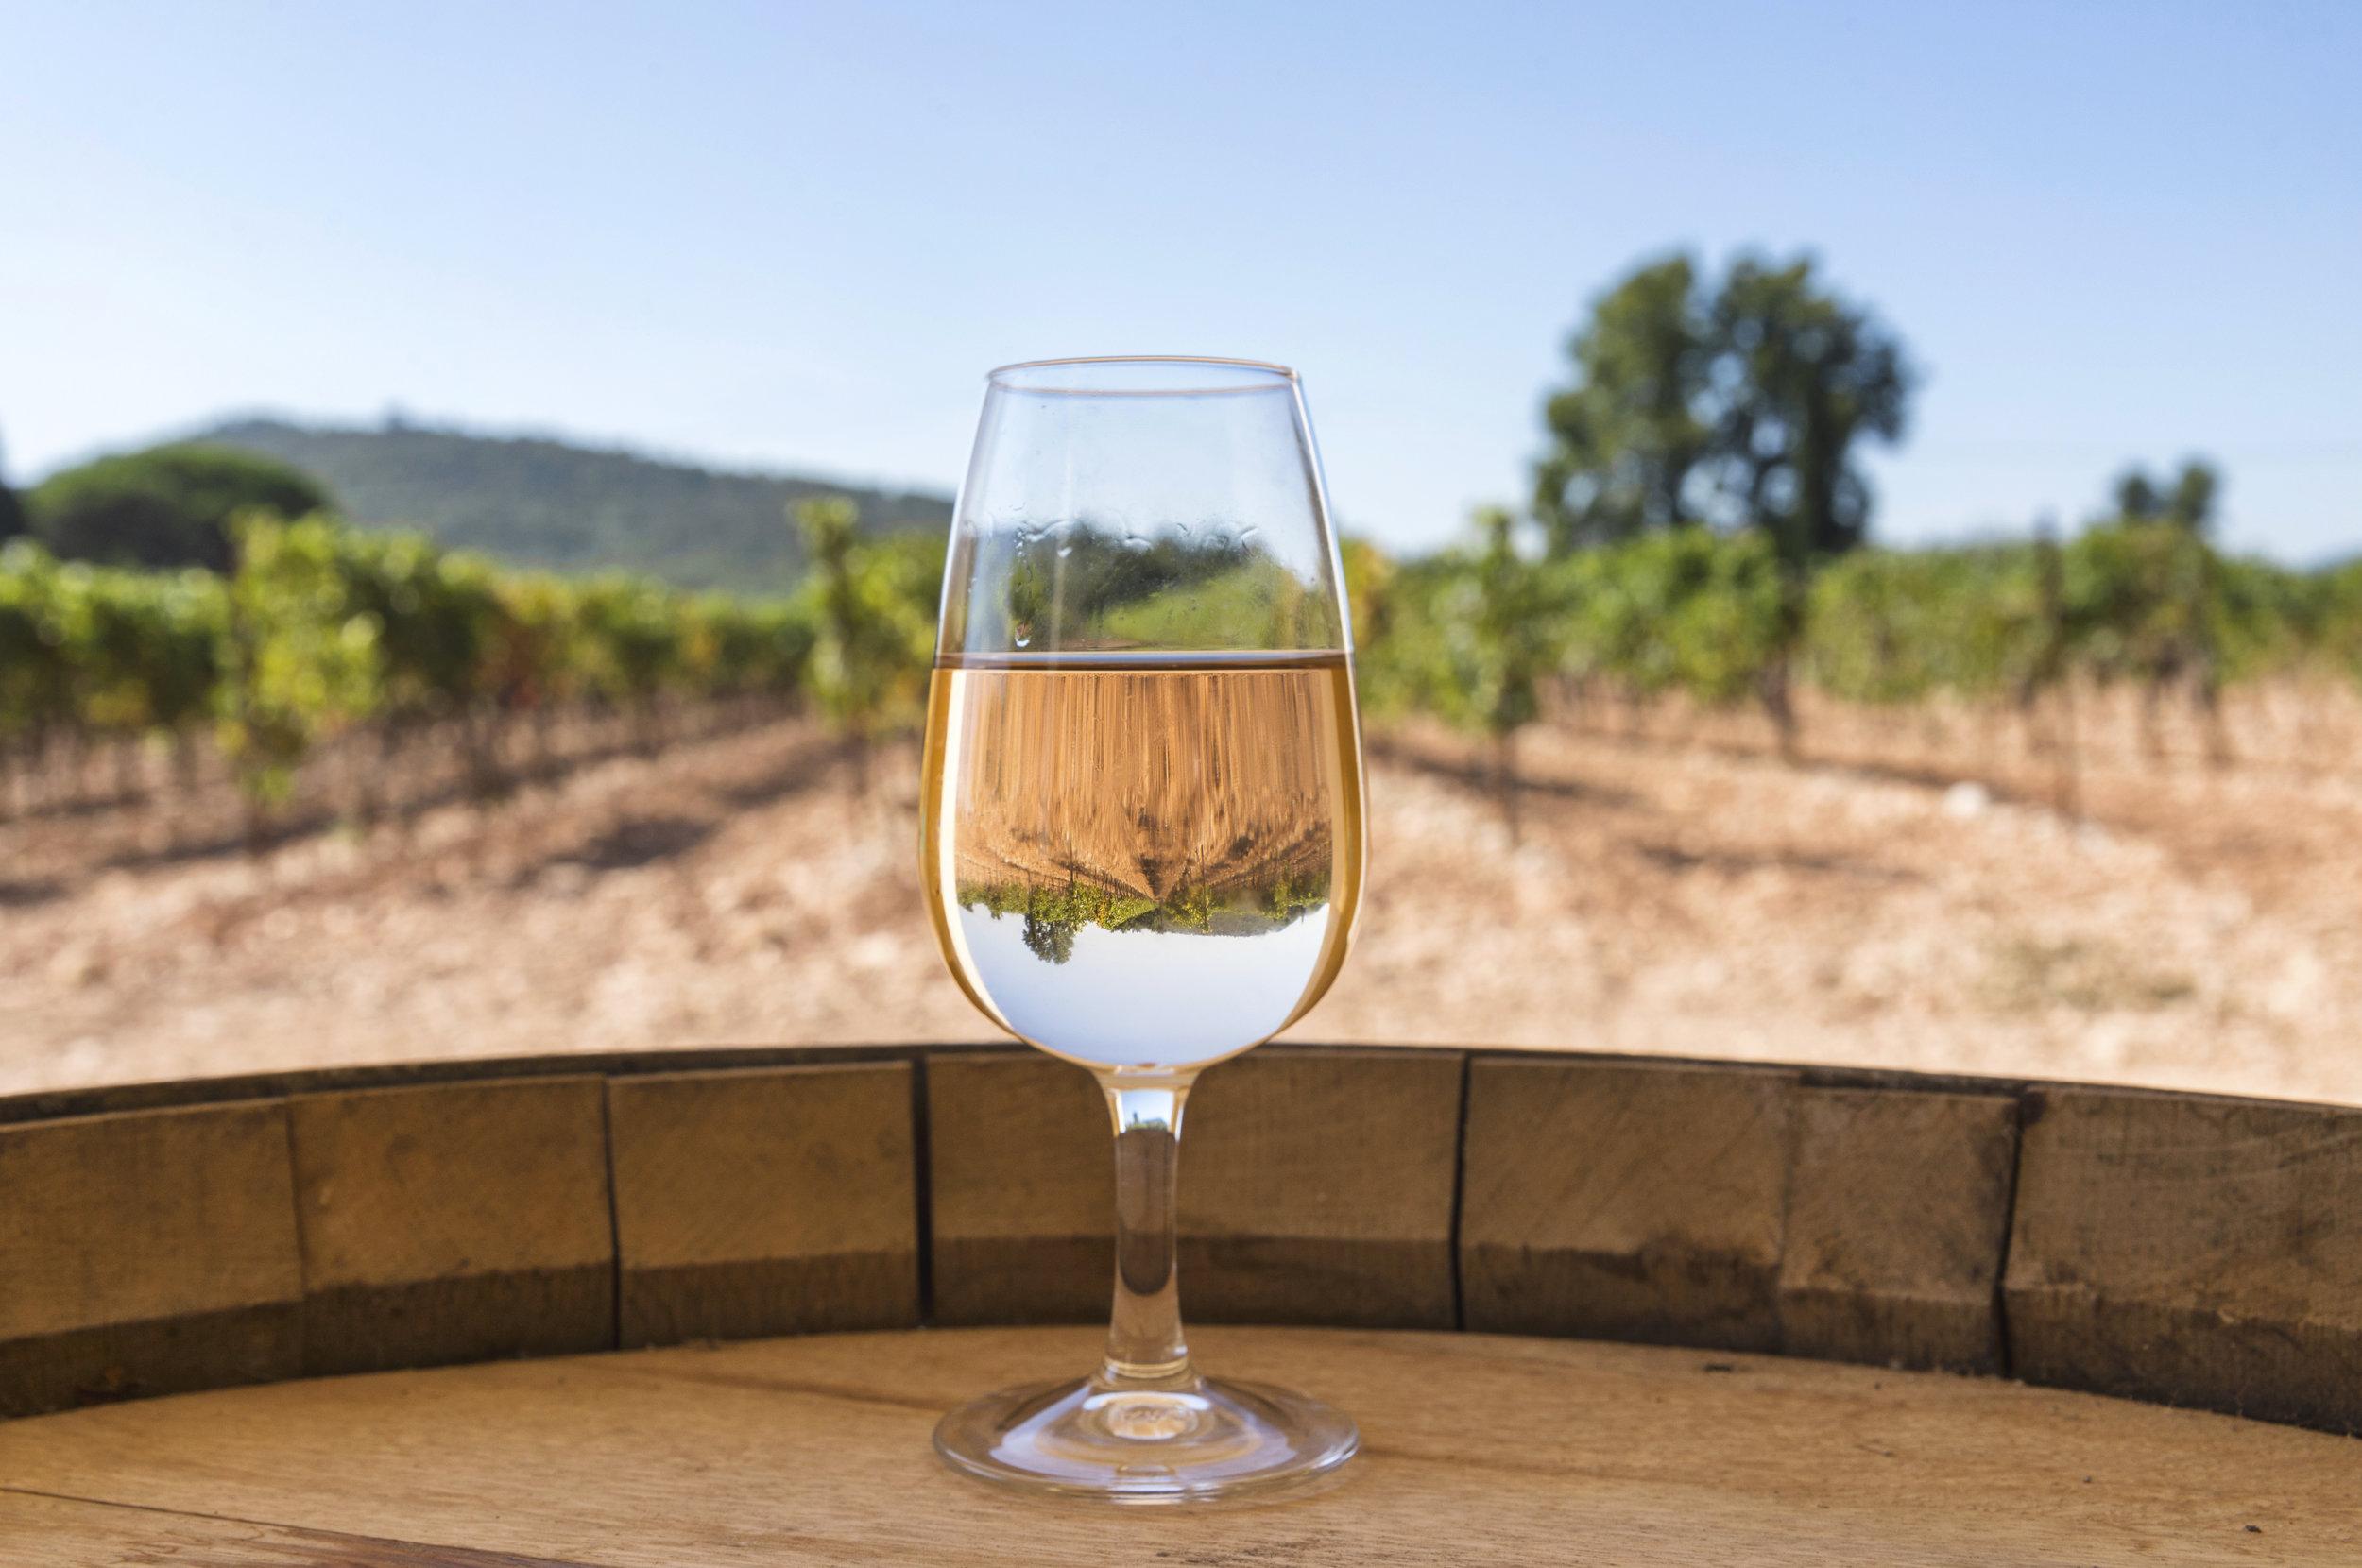 Côtes de Provence - Key Facts: